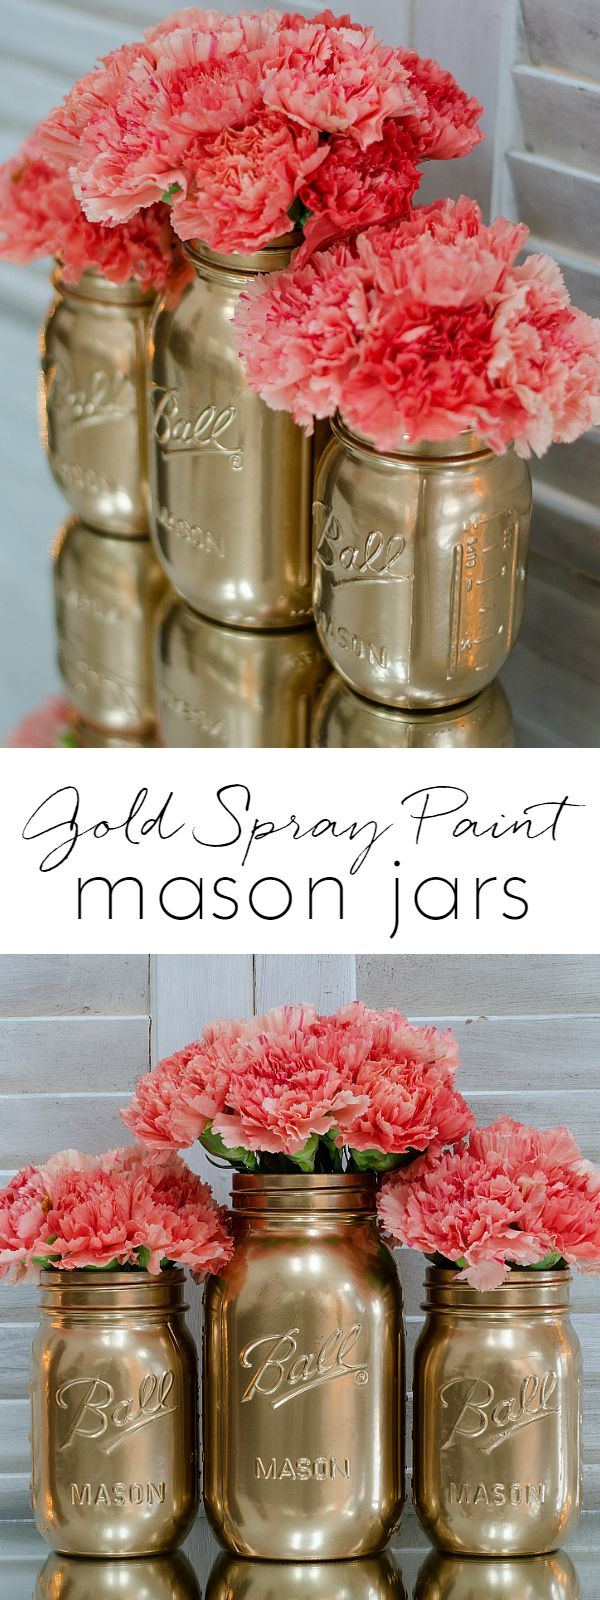 How To Spray Paint Jars - Gold Spray Painted Mason Jars - Mason Jar Craft Ideas - Mason Jar Vase Ideas @www.masonjarcraftslove.com